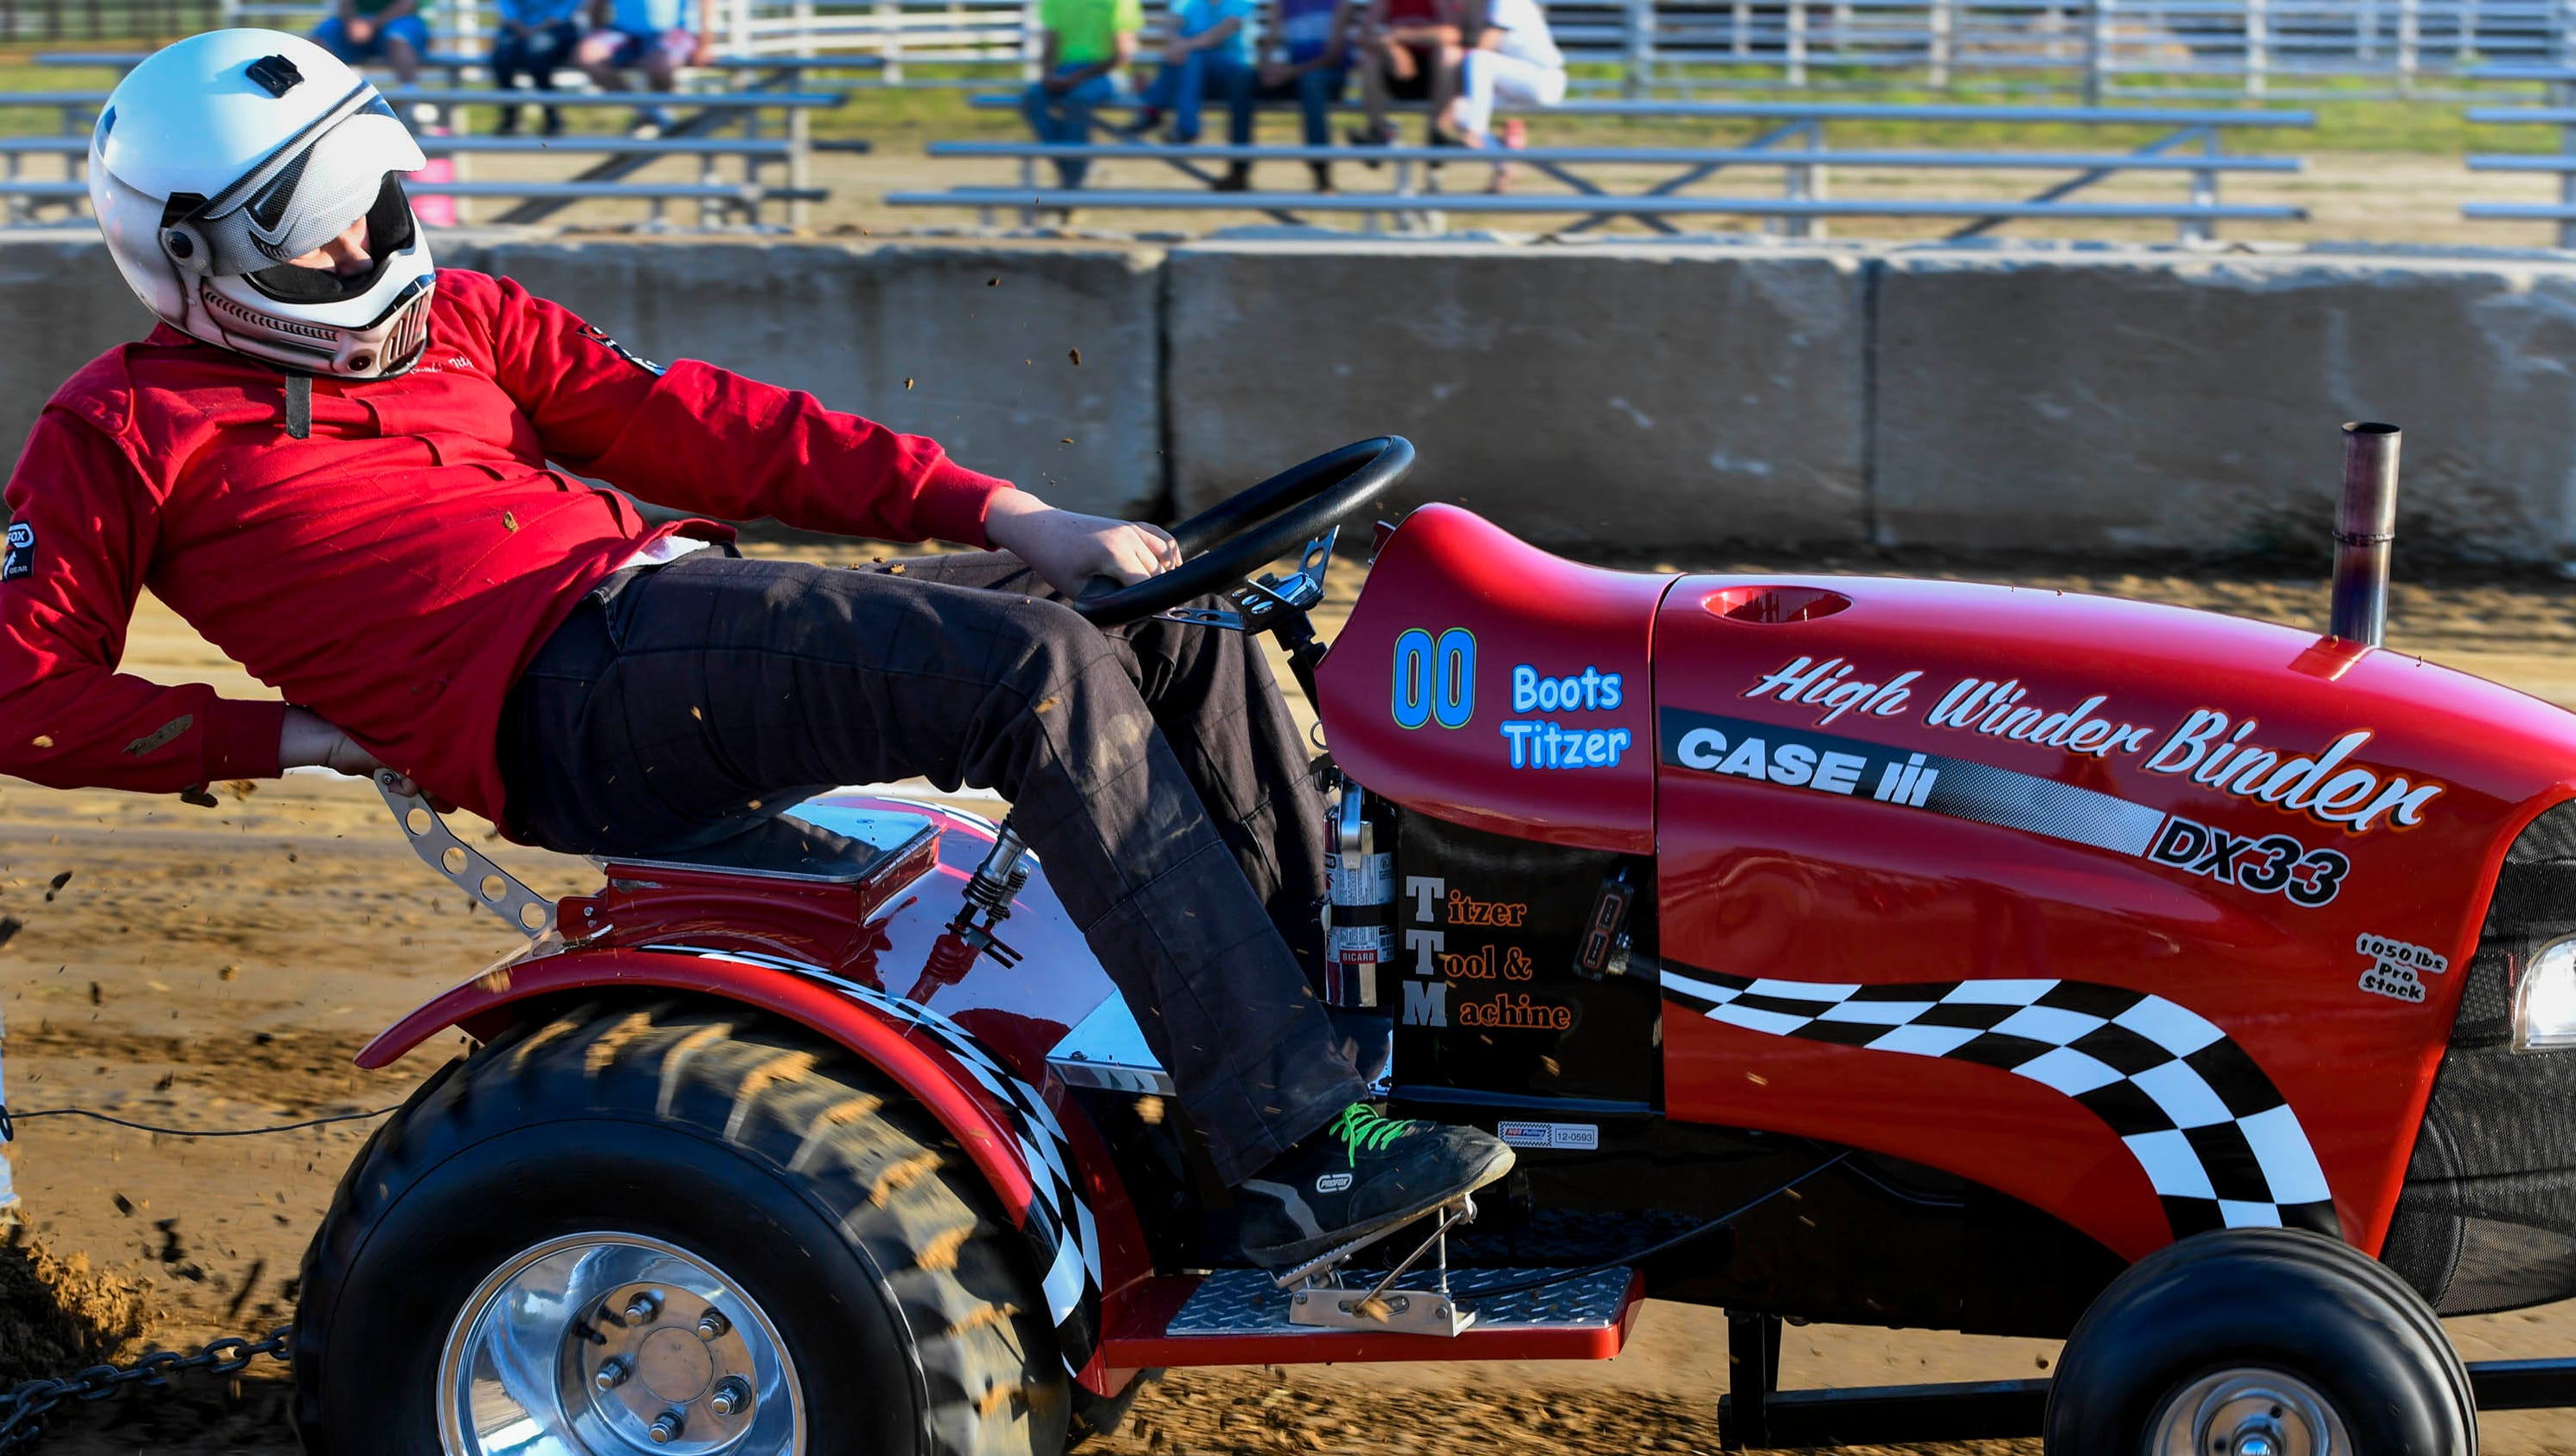 Garden Pulling Tractor Decal : Garden tractor pull